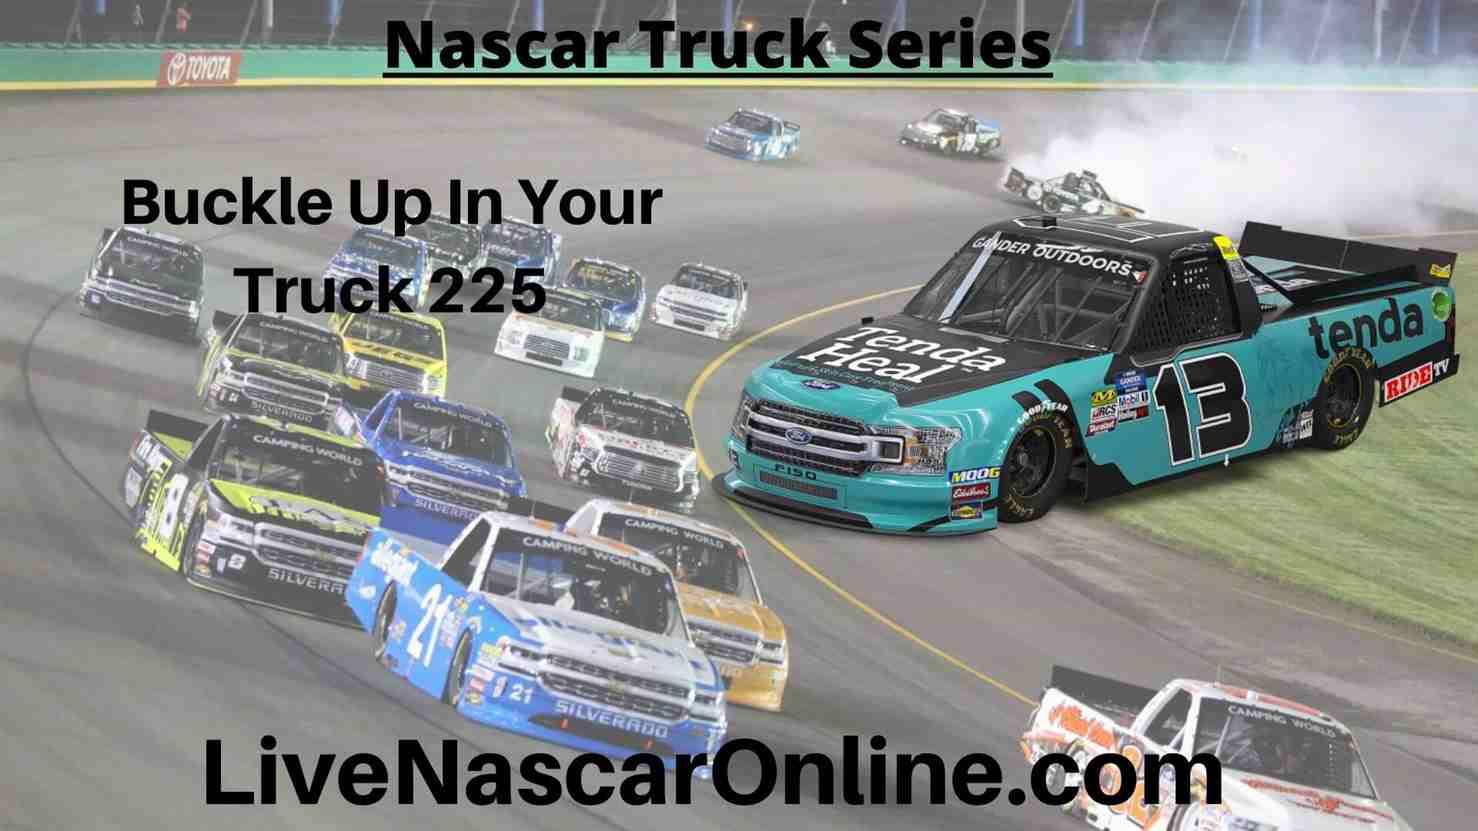 Buckle Up In Your Truck 225 Online Stream | NASCAR Kentucky 2020